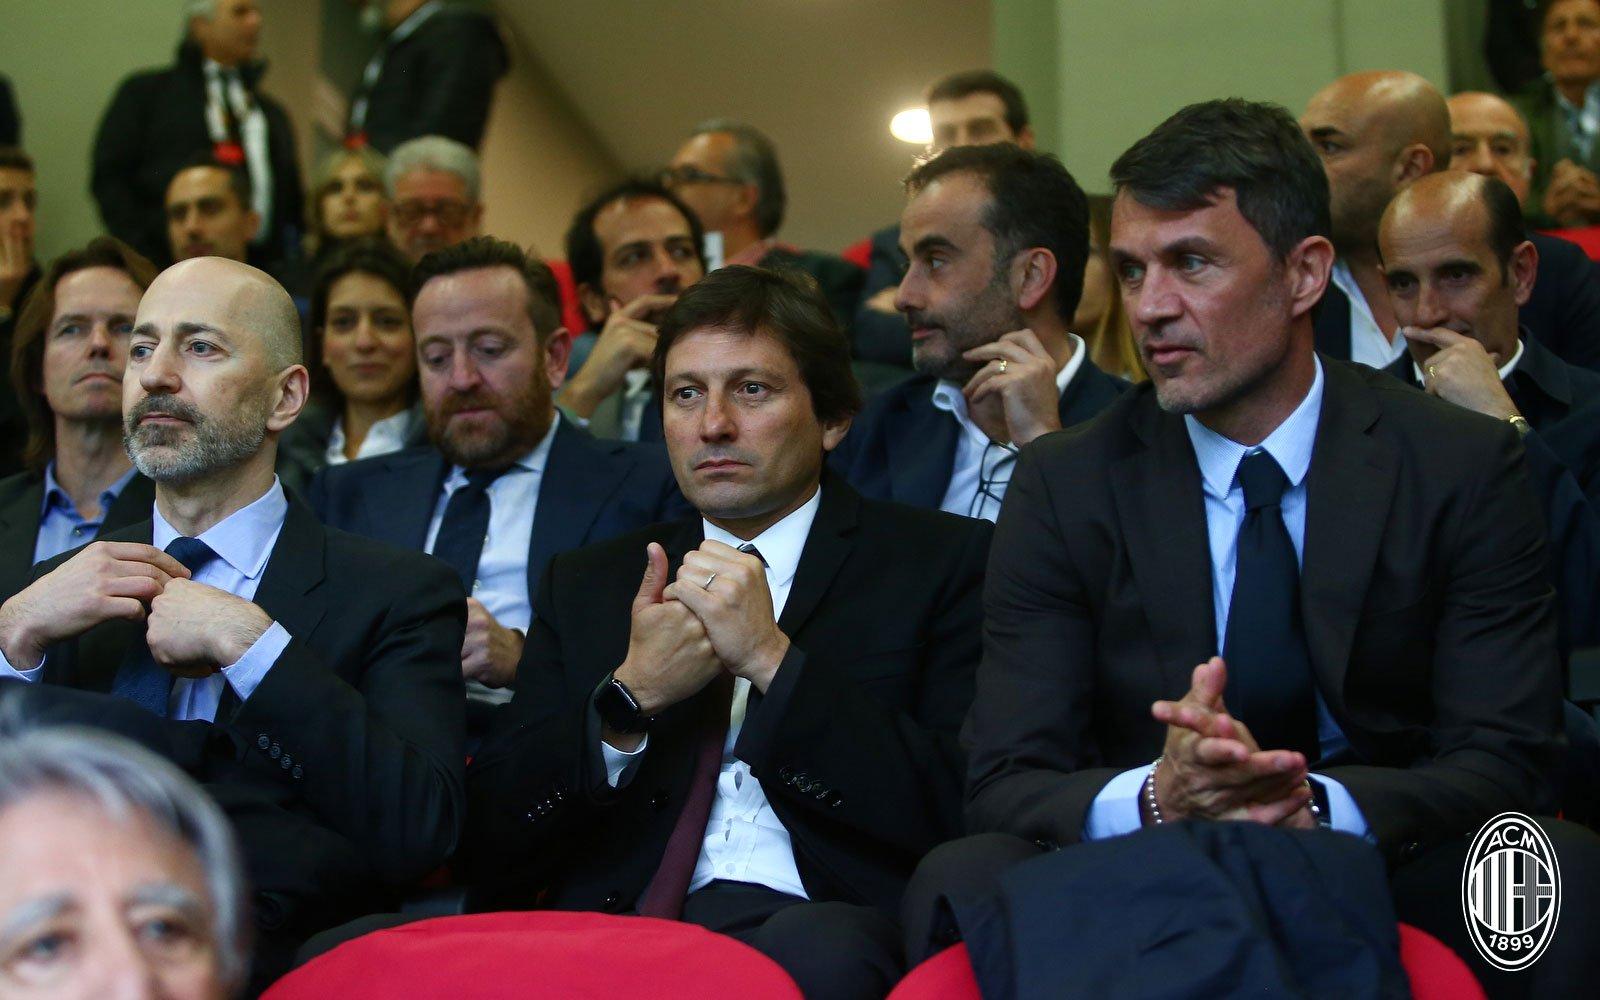 Ivan Gazidis, Leonardo and Paolo Maldini during Milan-Udinese on April 2, 2019. (@acmilan.com)